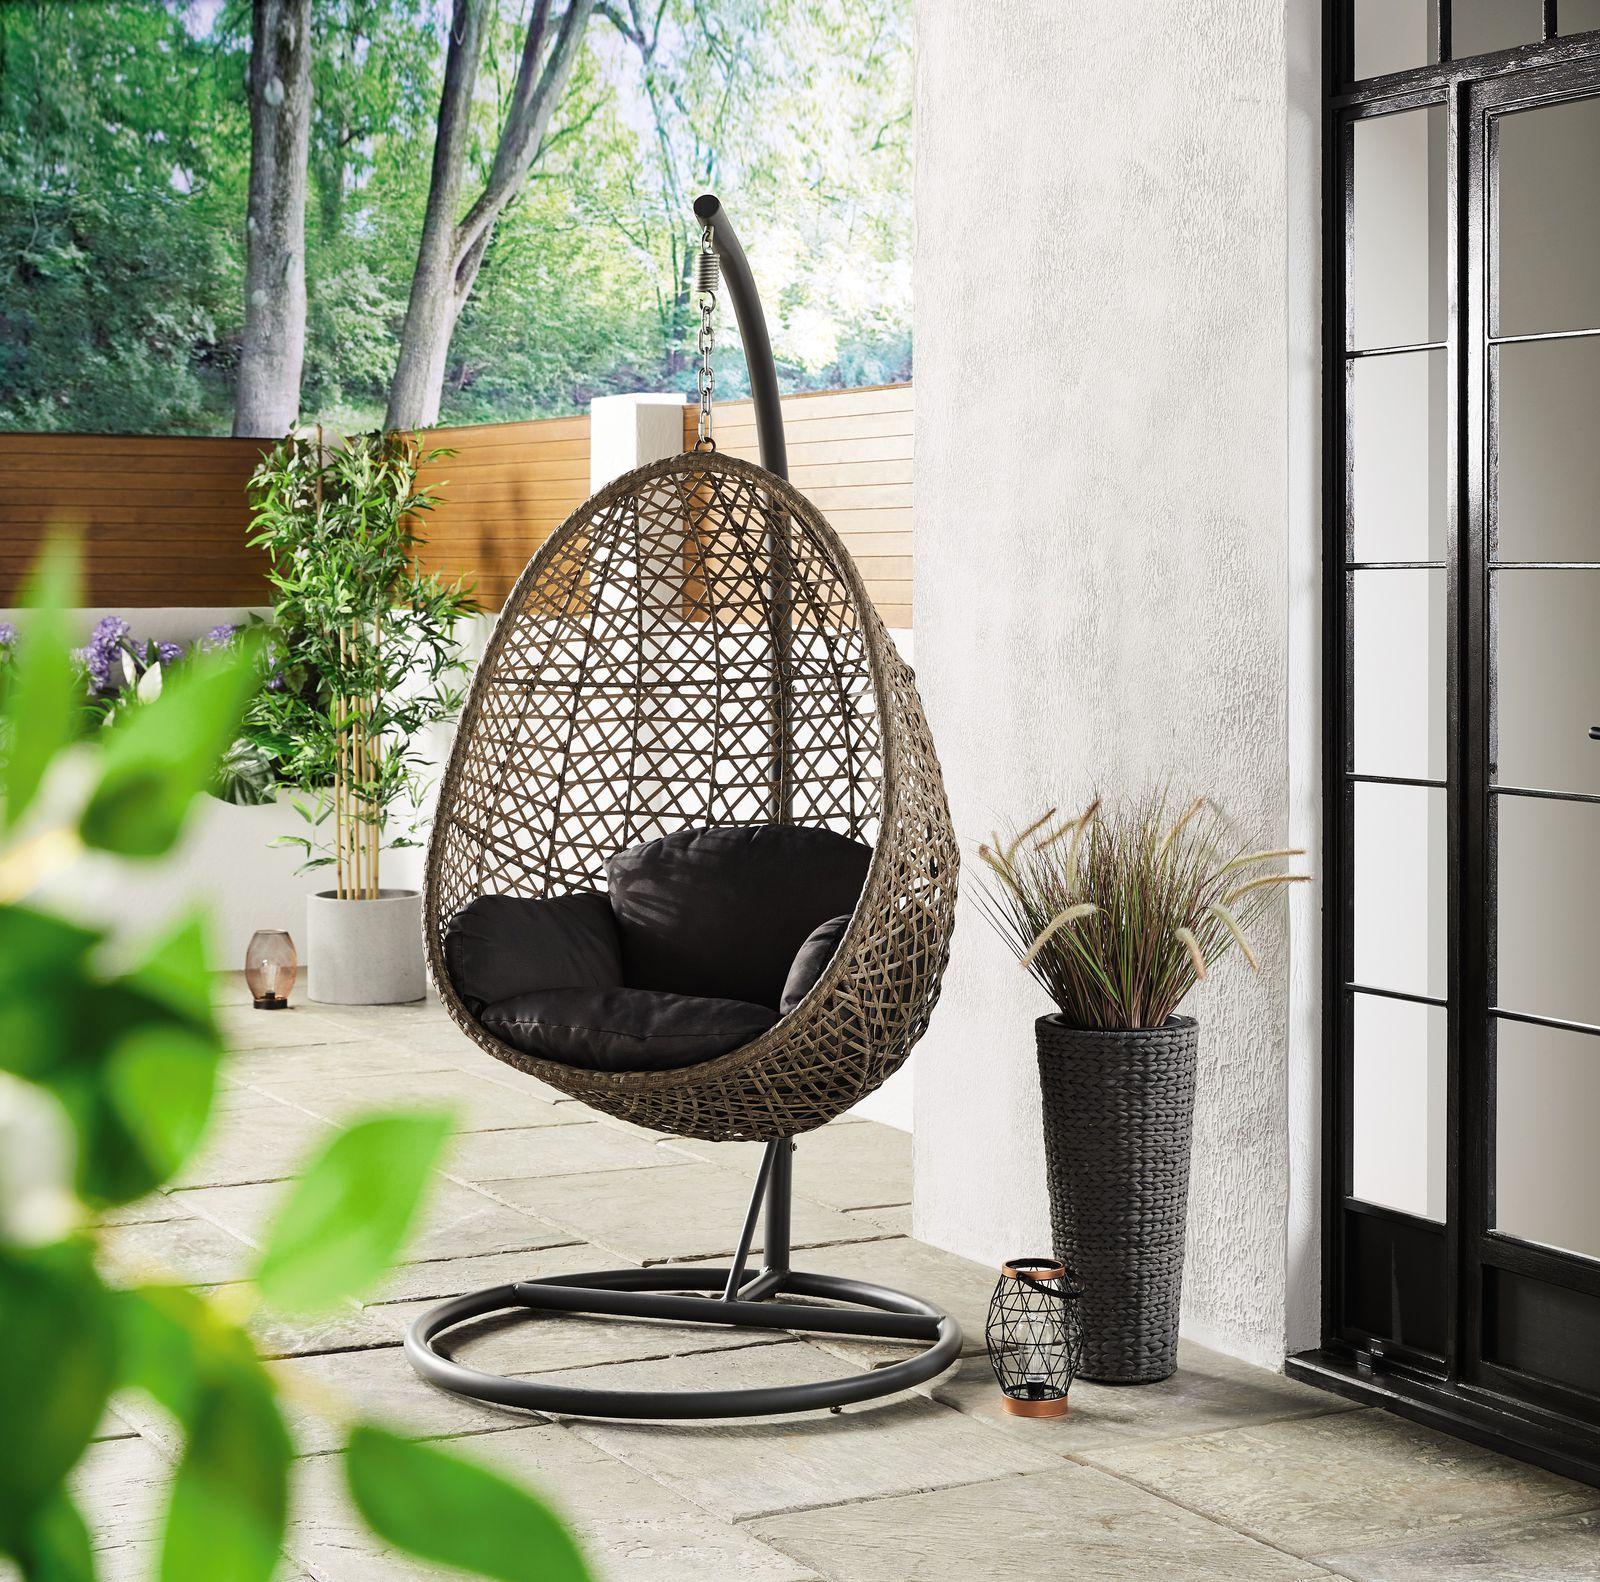 Egg Chair Hanging Aldi